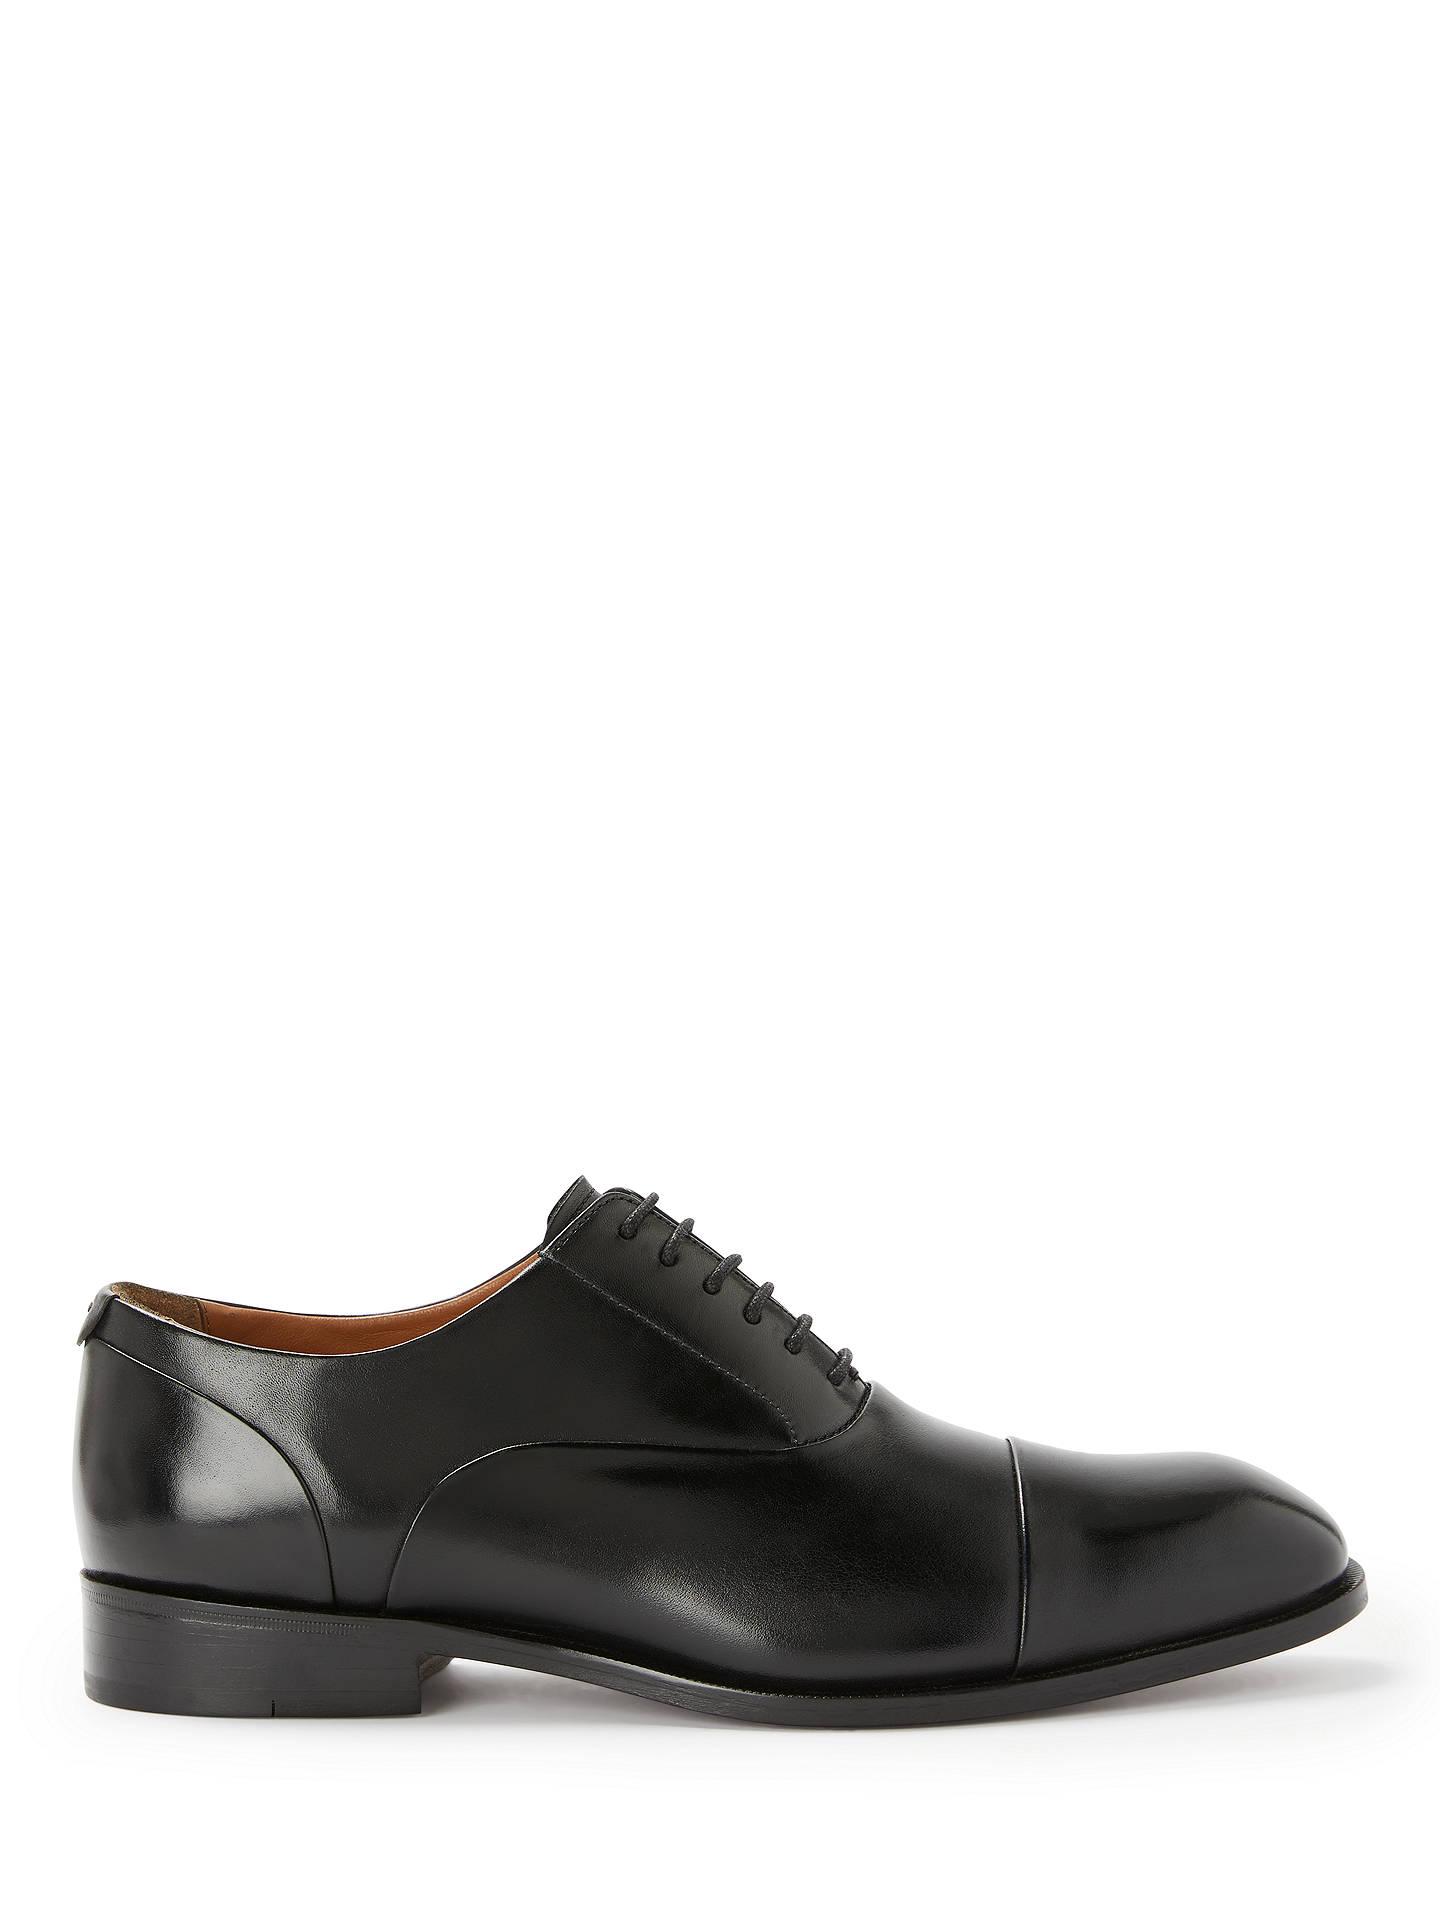 85e8815d76 Buy John Lewis & Partners Goodwin Oxford Leather Lace-Up Shoes, Black, 7 ...